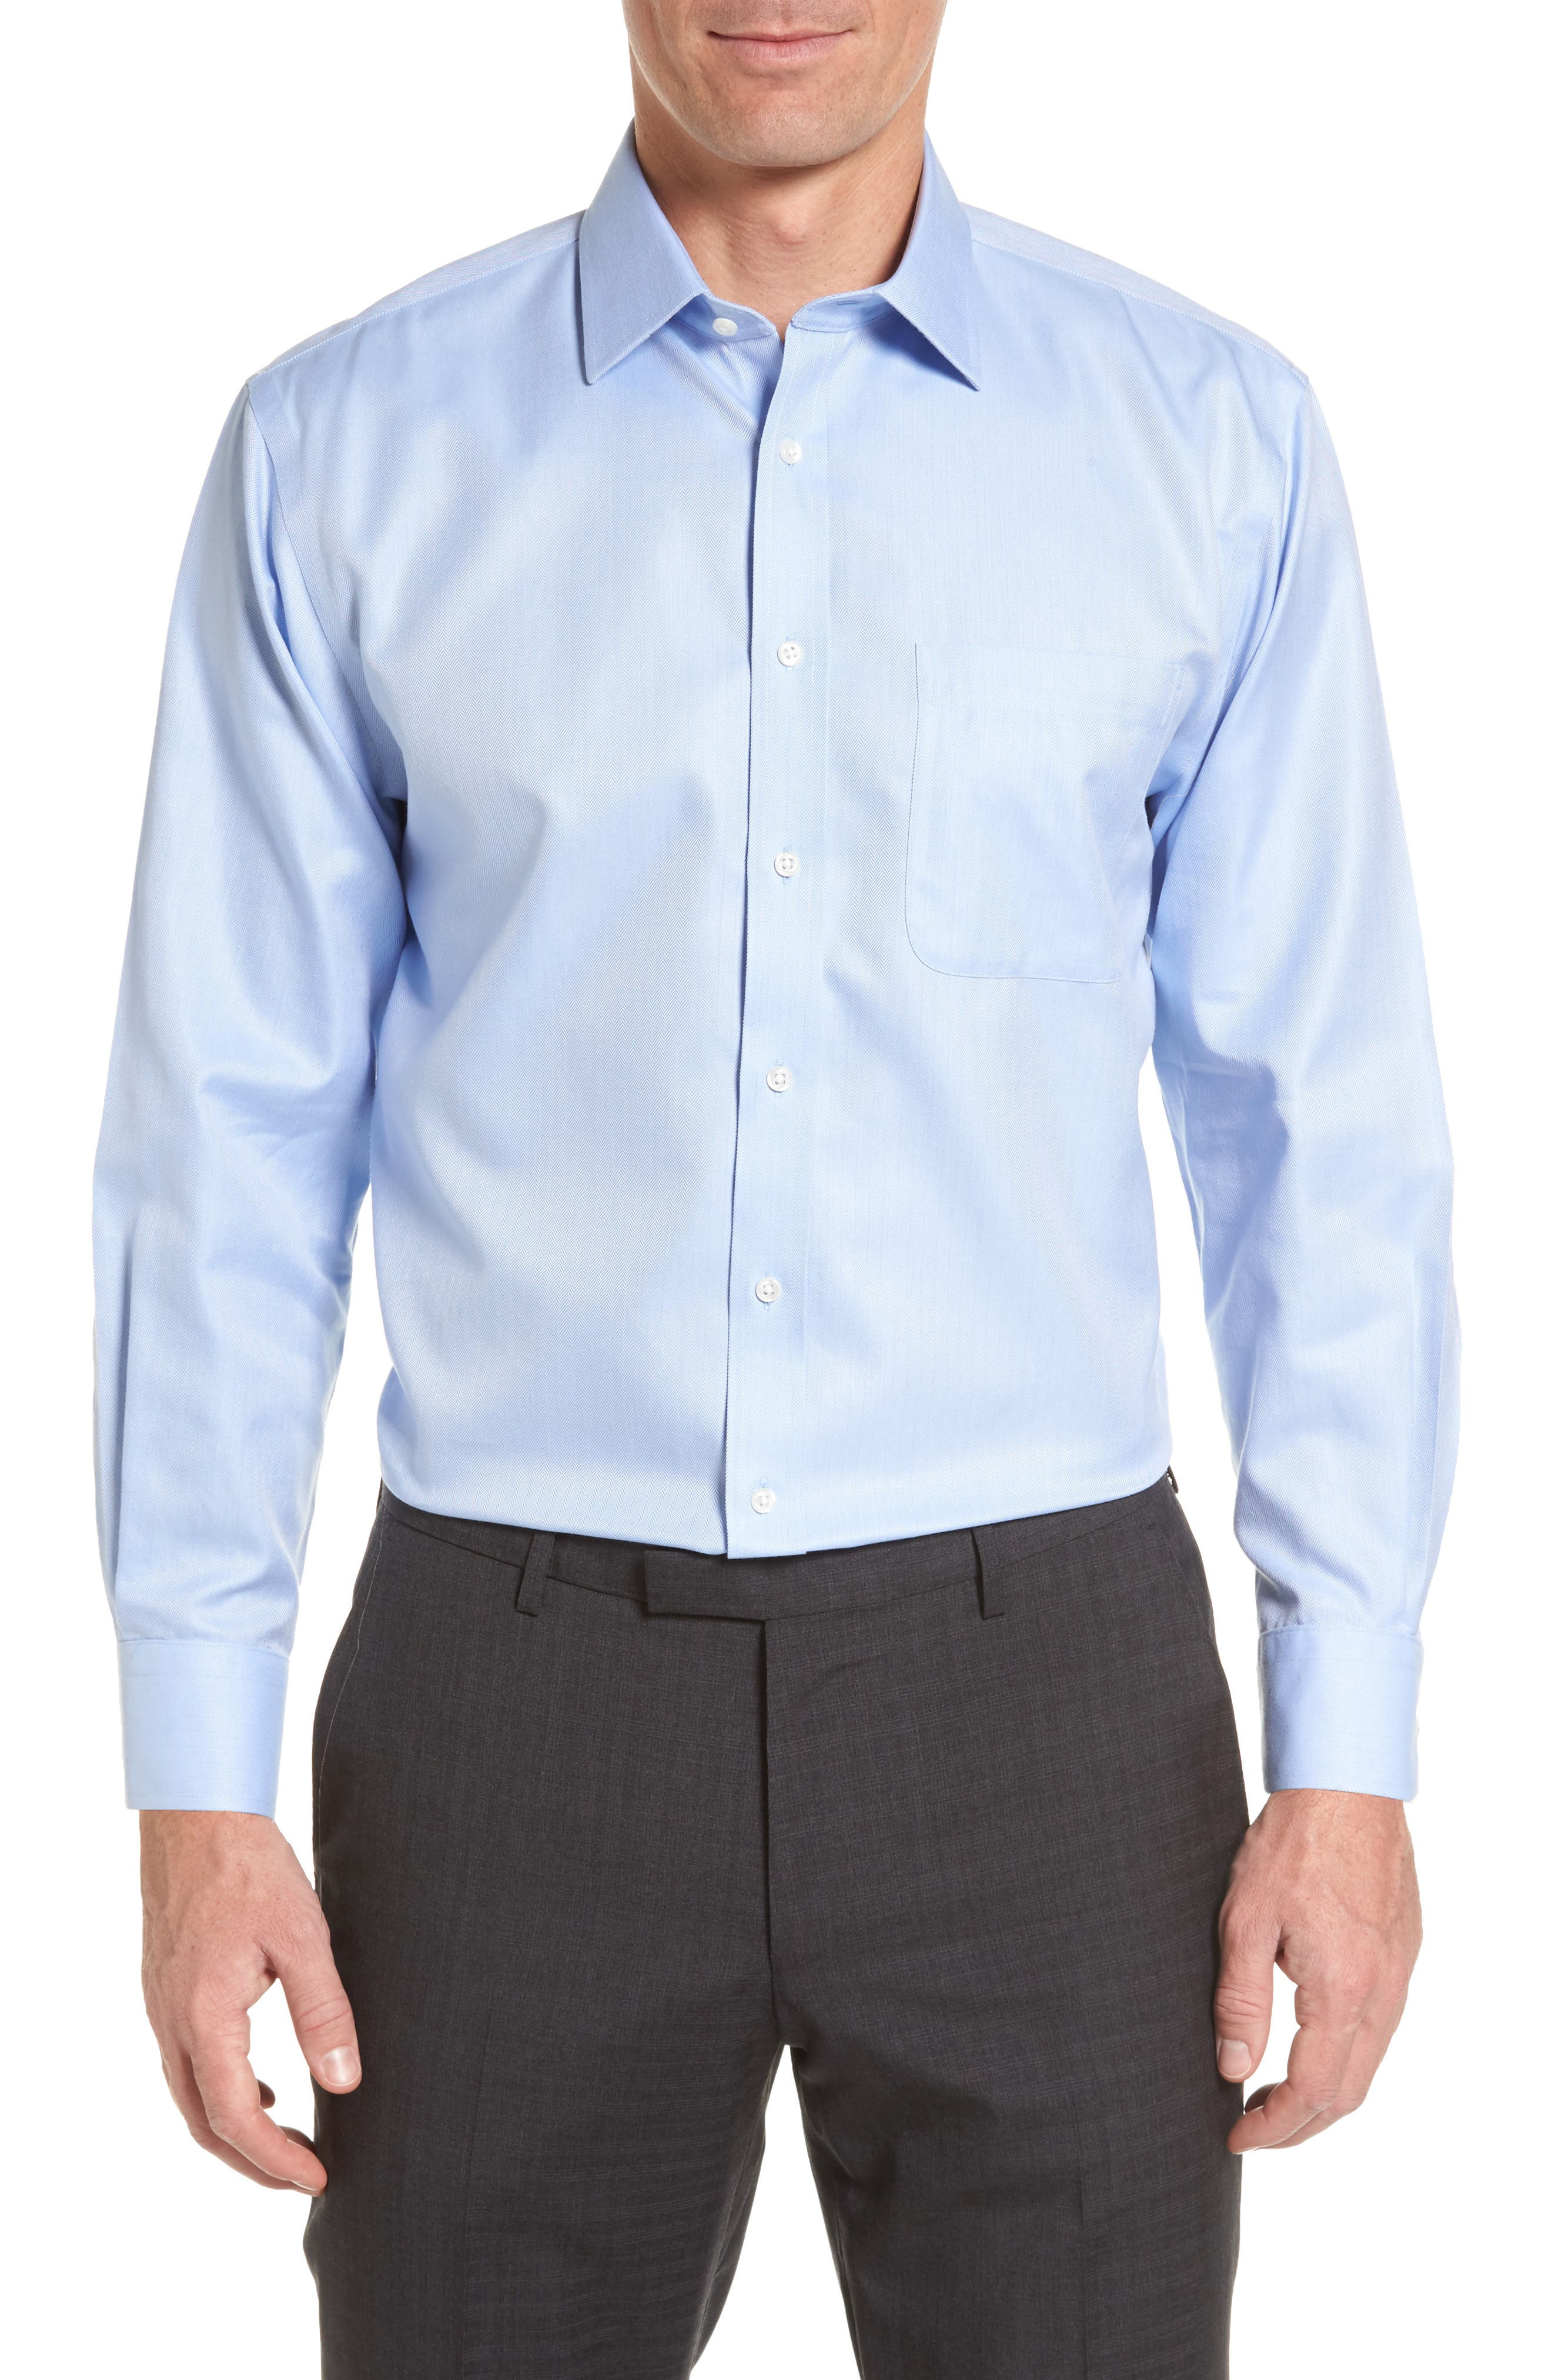 Nordstrom Shop Smartcare(TM) Traditional Fit Herringbone Dress Shirt - Blue